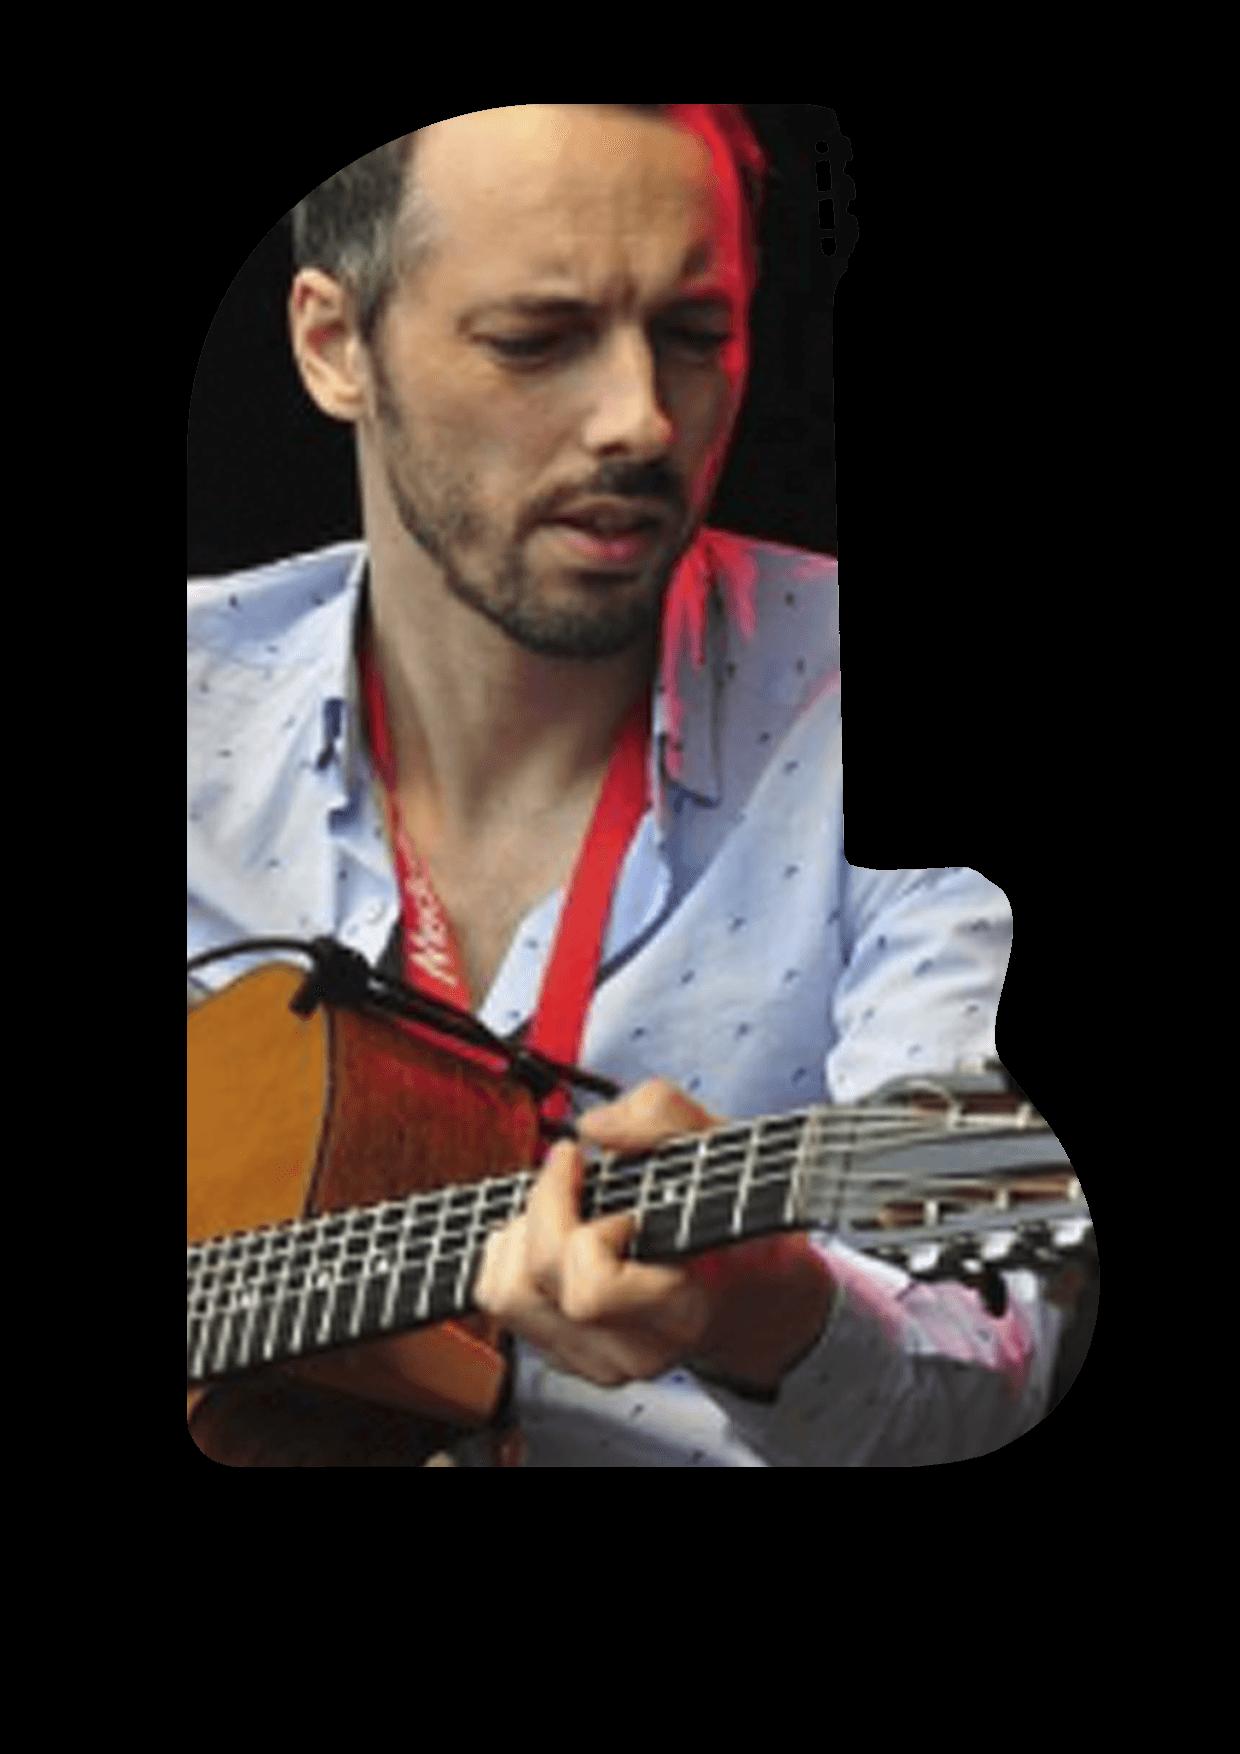 to-become-music-logo-jazz-manouche-stochelo-rosenberg-julien-cattiaux-costel-nitescu-noe-reinhardt-rocky-gresset-django-concert-visu-julien-2